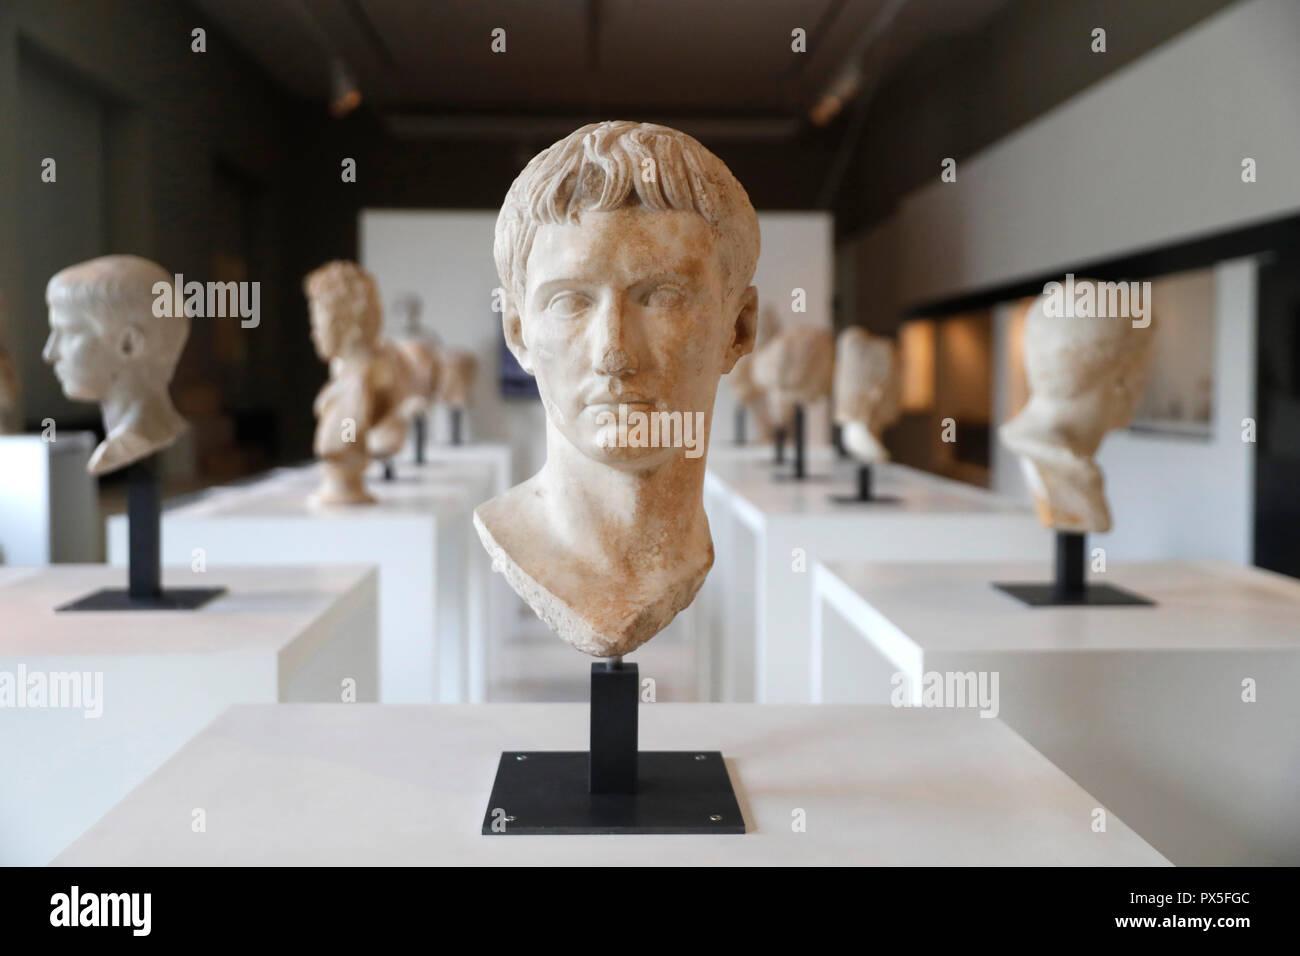 Museo de Arte e Historia. Gaius Octavius Thurinus (Augusto). Ginebra. Suiza. Foto de stock